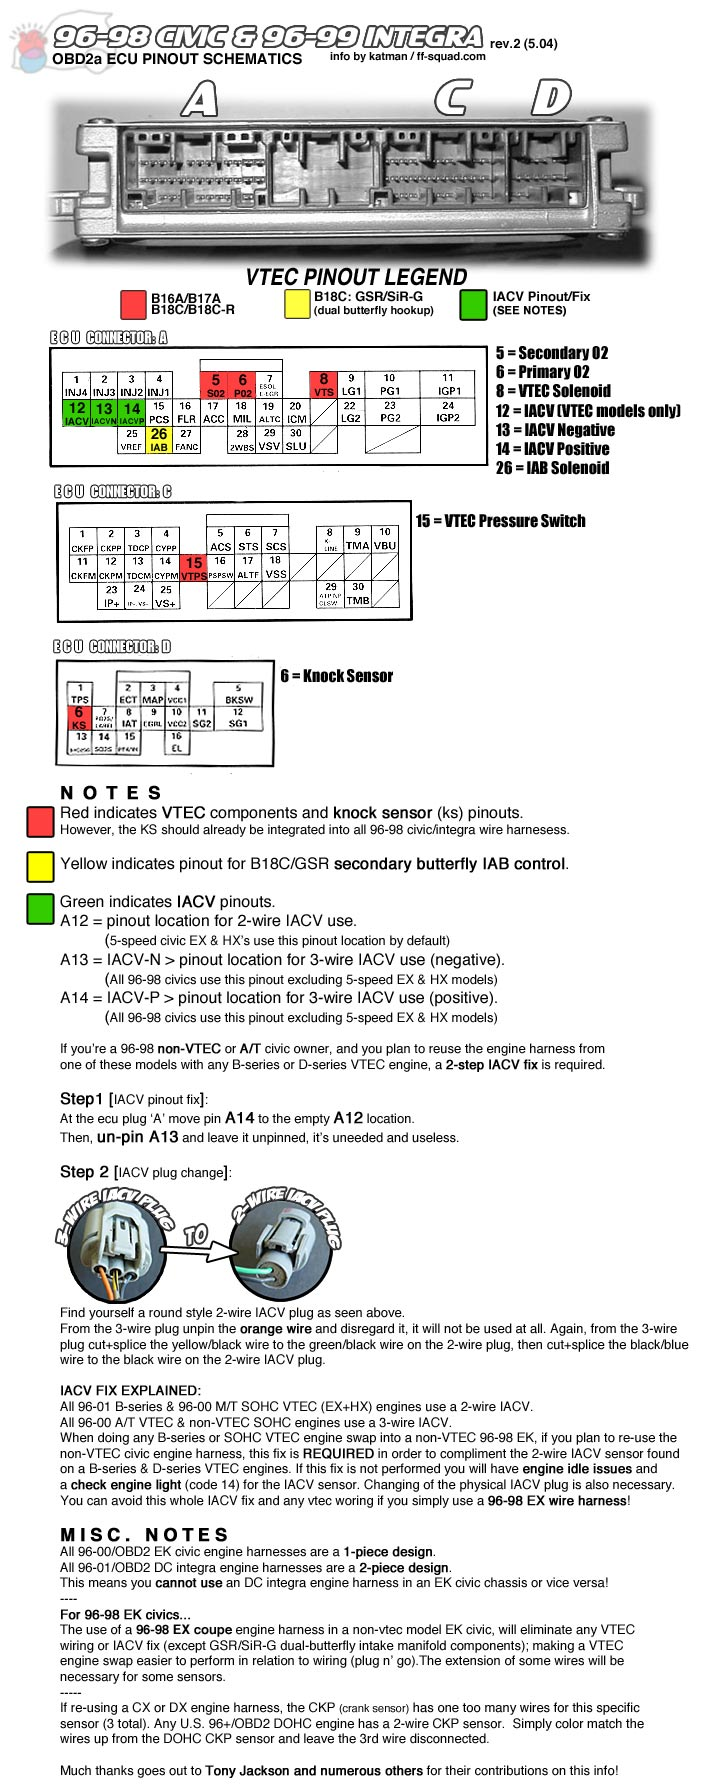 92 00 engine swap wiring the sixth gen rh sixwerks com ECU Circuits 2001 BMW 325I Wiring Diagram